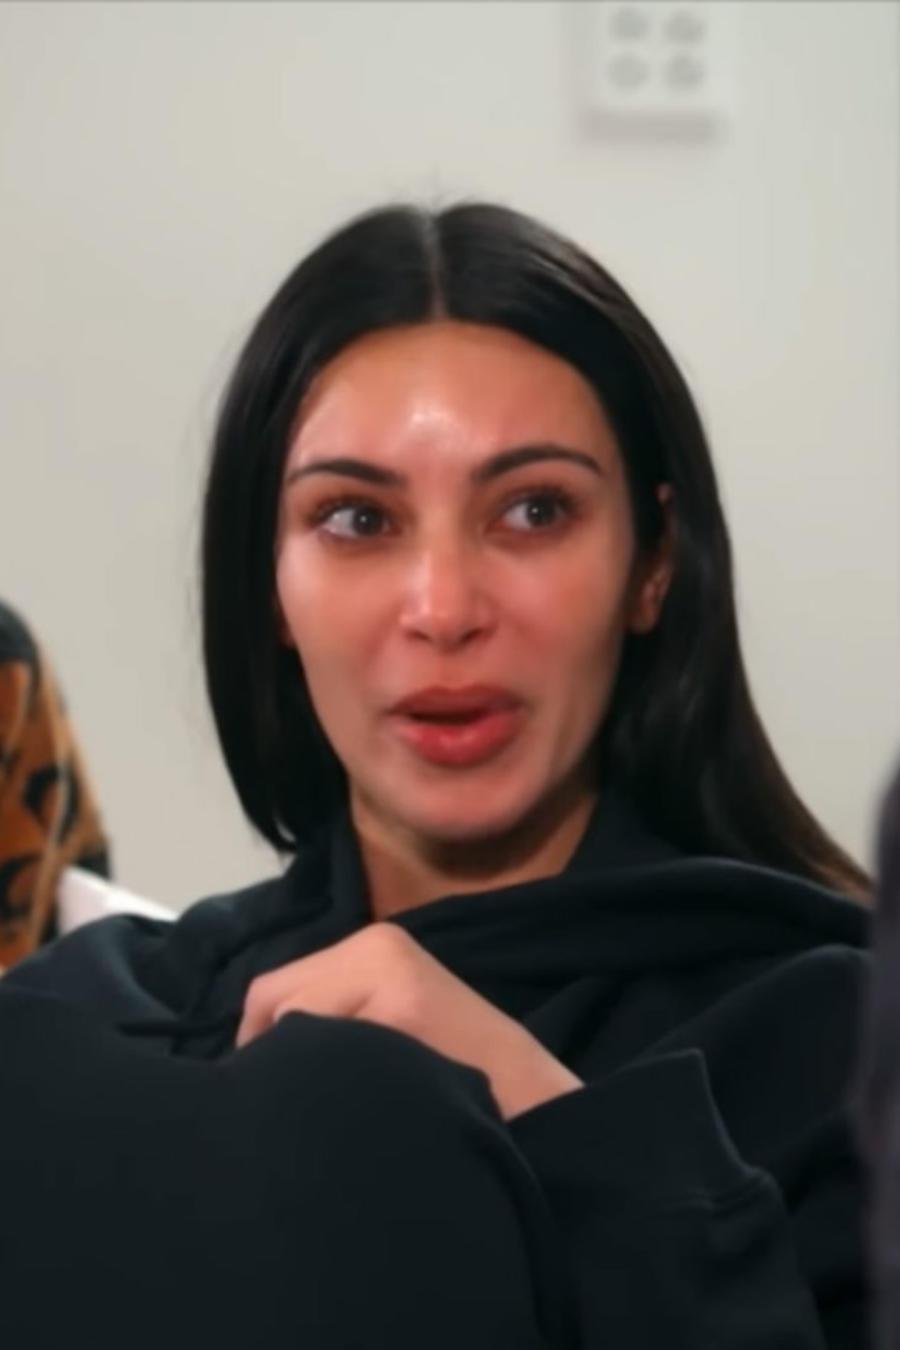 Kim Kardashian hablado con Khloe y Kourtney